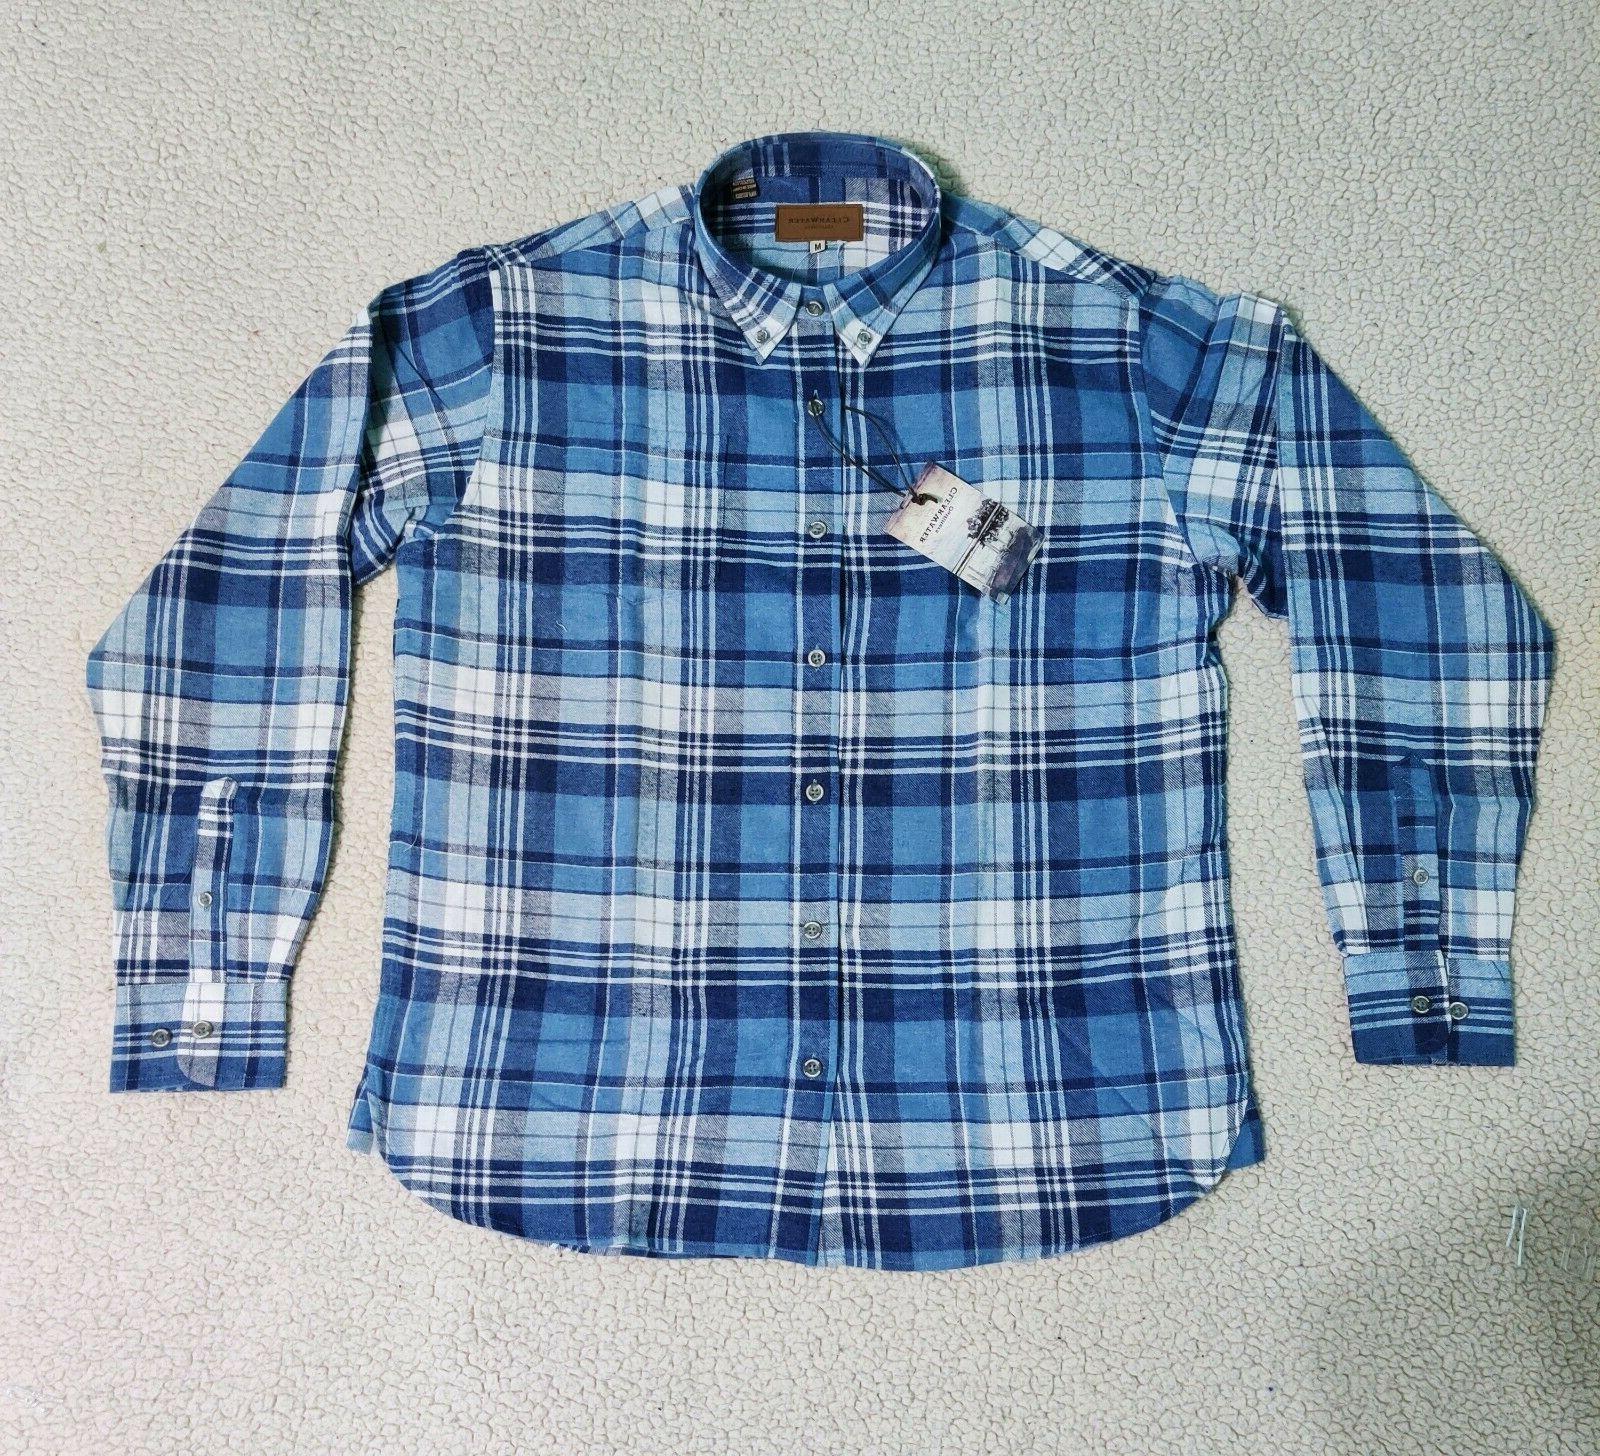 Mens Flannel Up Shirts | Men's M